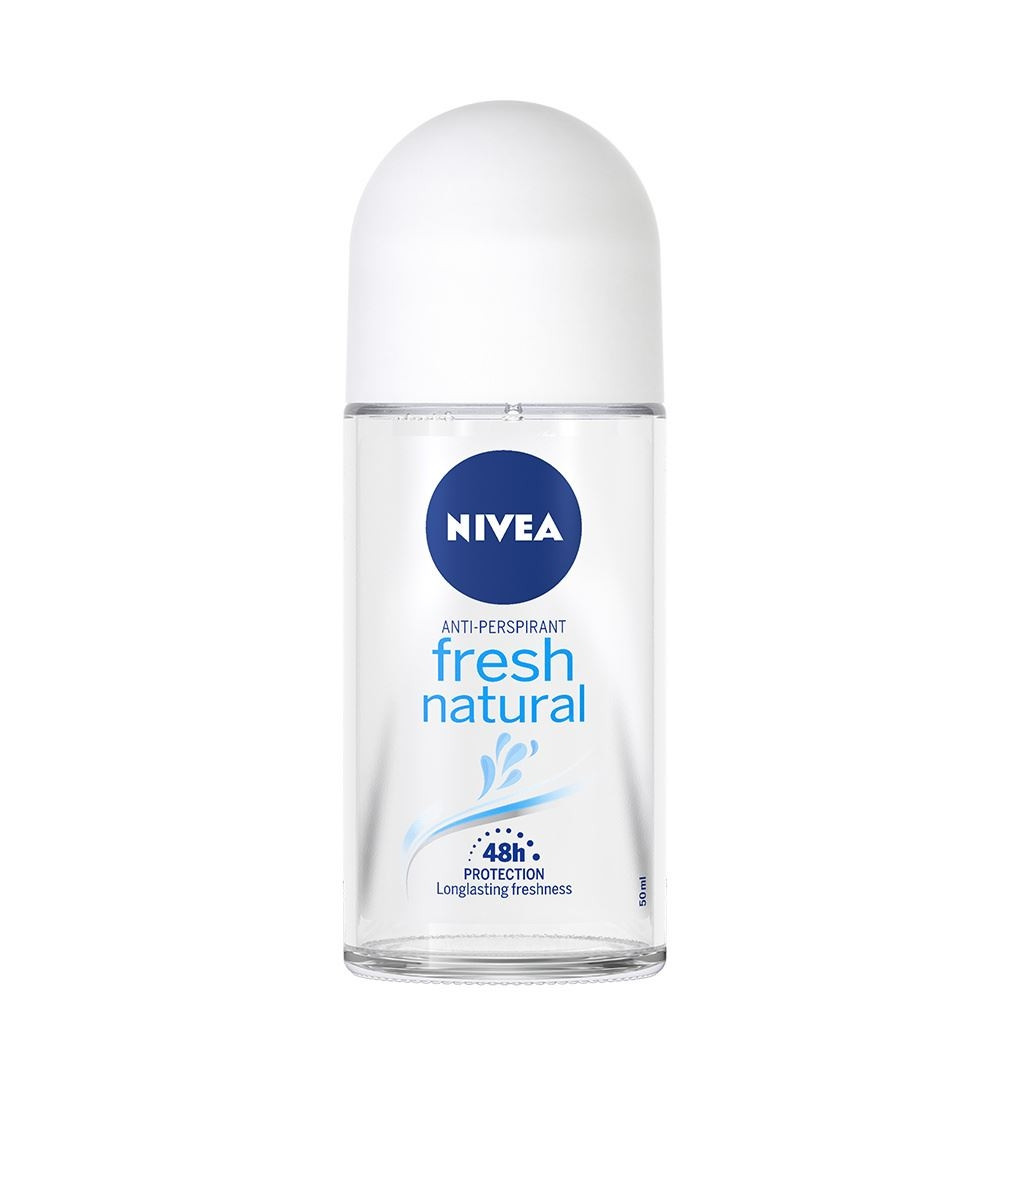 НИВЕА ФРЕШ НАТУРАЛ Дезодорант рол-он 50мл | NIVEA FRESH NATURAL Anti-perspirant roll-on 50ml